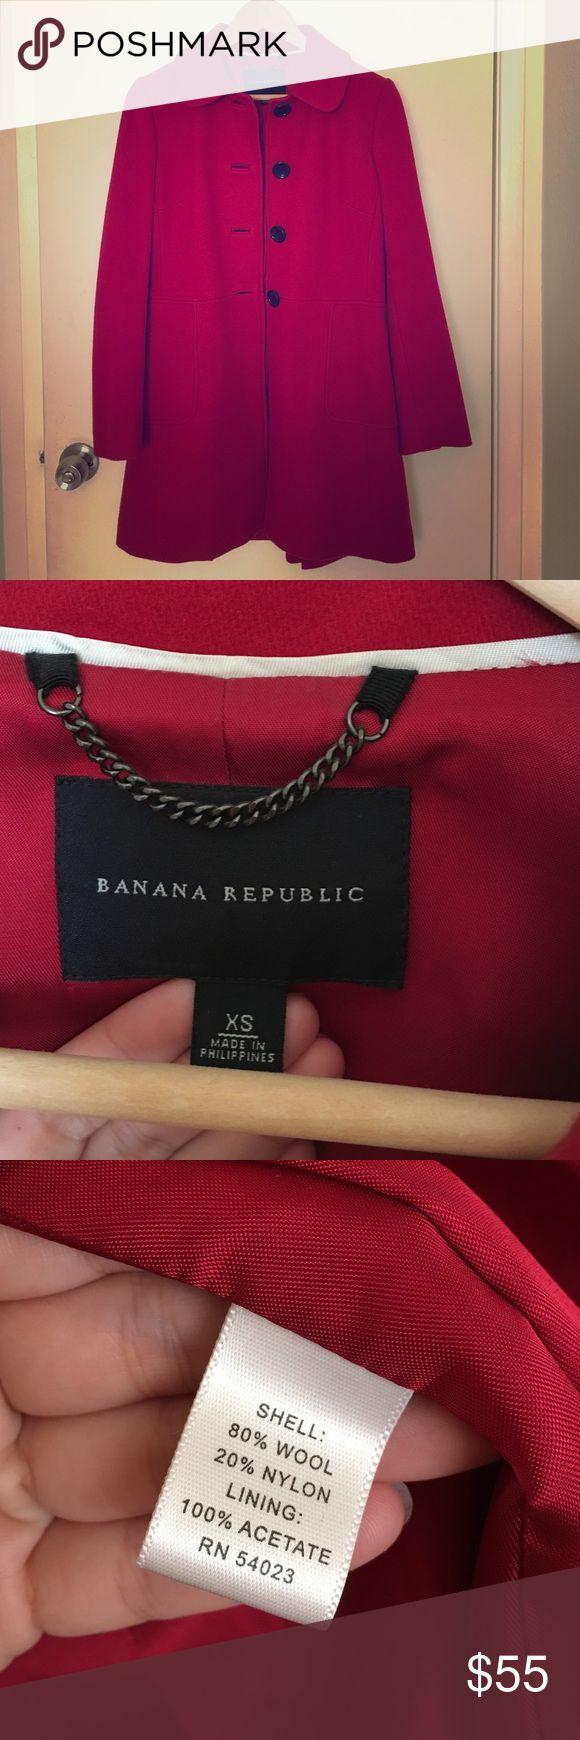 Banana Republic coat In excellent condition. Size xs. Banana Republic Jackets & Coats Blazers